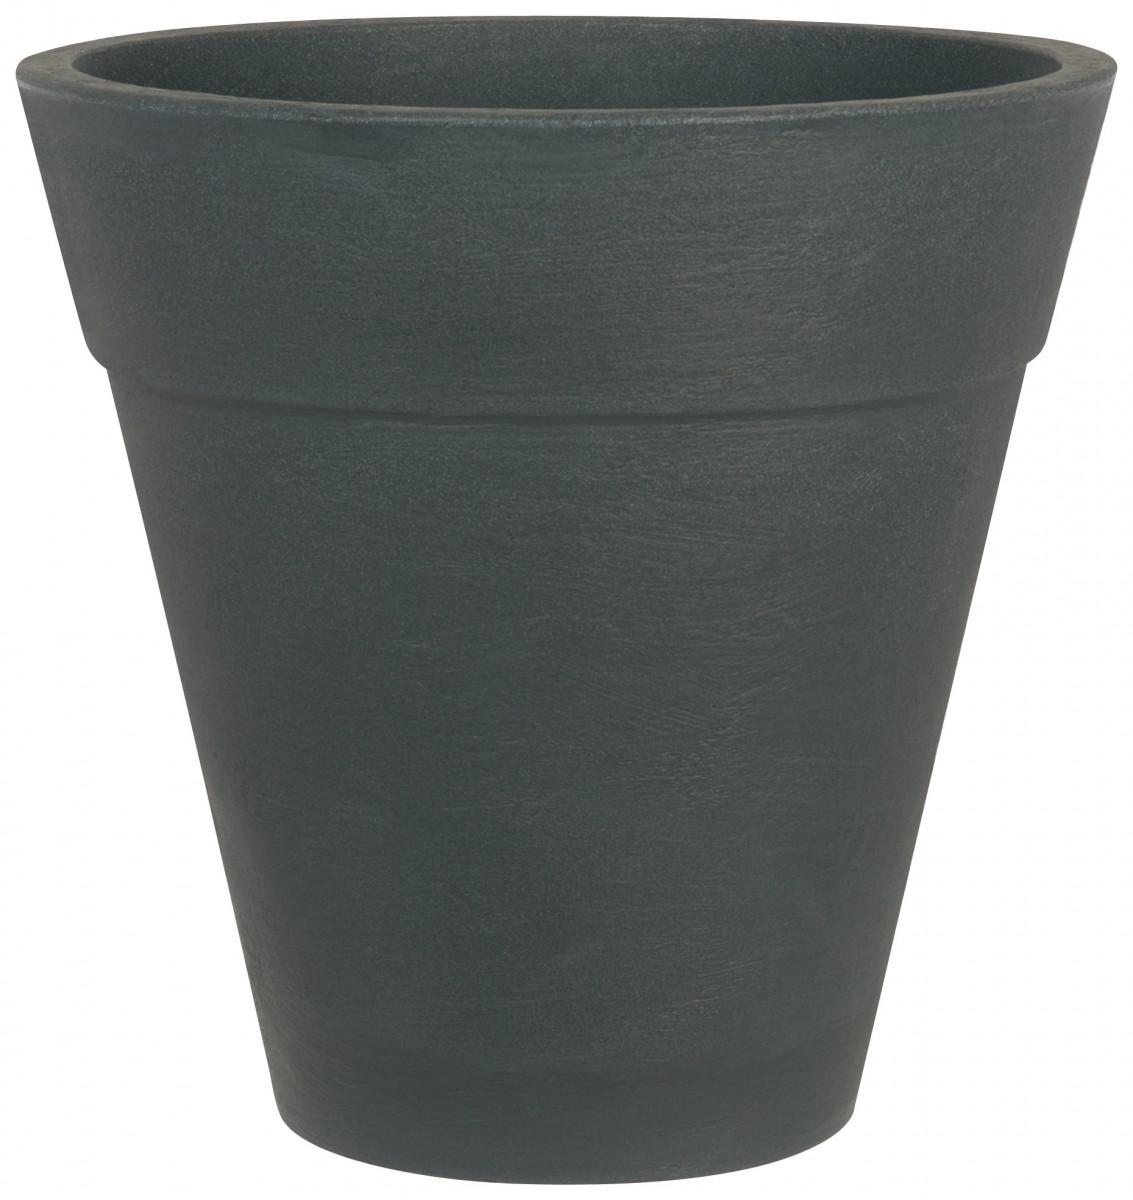 pflanzk bel turin 50 cm rund aus stabilem kunststoff gartencenter pflanzgef e terraoptik. Black Bedroom Furniture Sets. Home Design Ideas